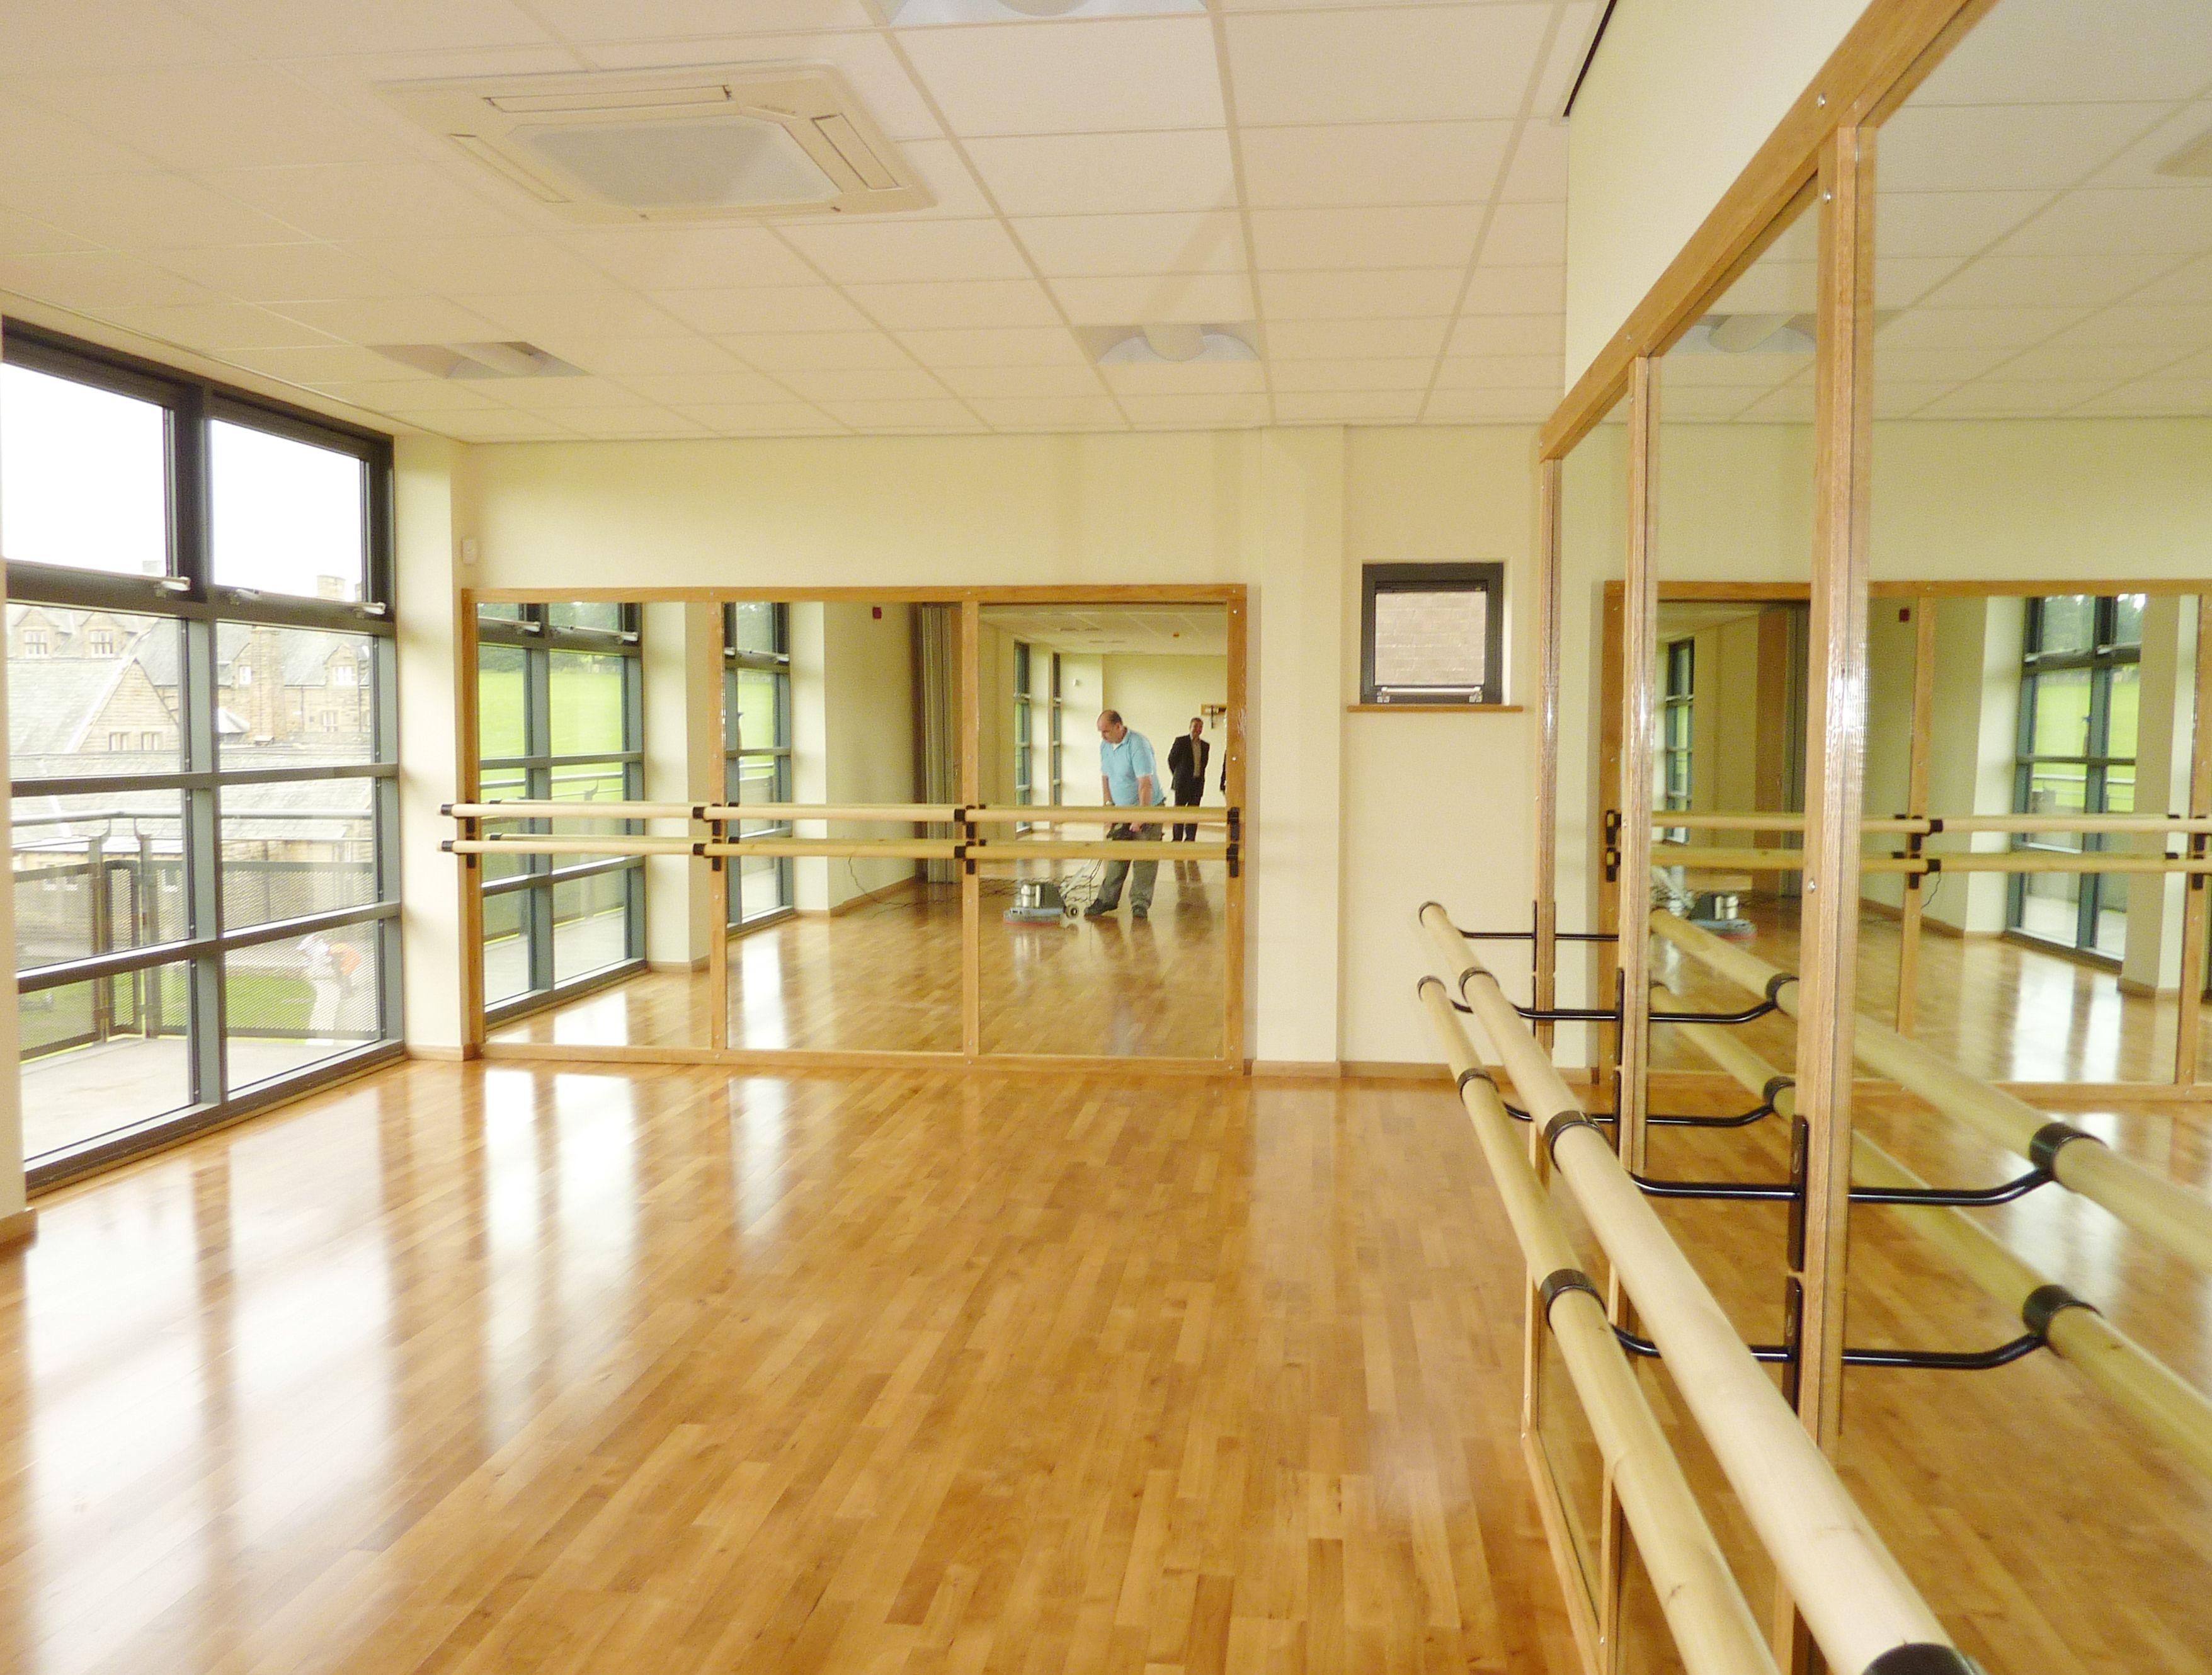 Dance Studio Design Ideas Home Art Dma Homes: An Image Of A Dance Studio Milbank Architects Designed For